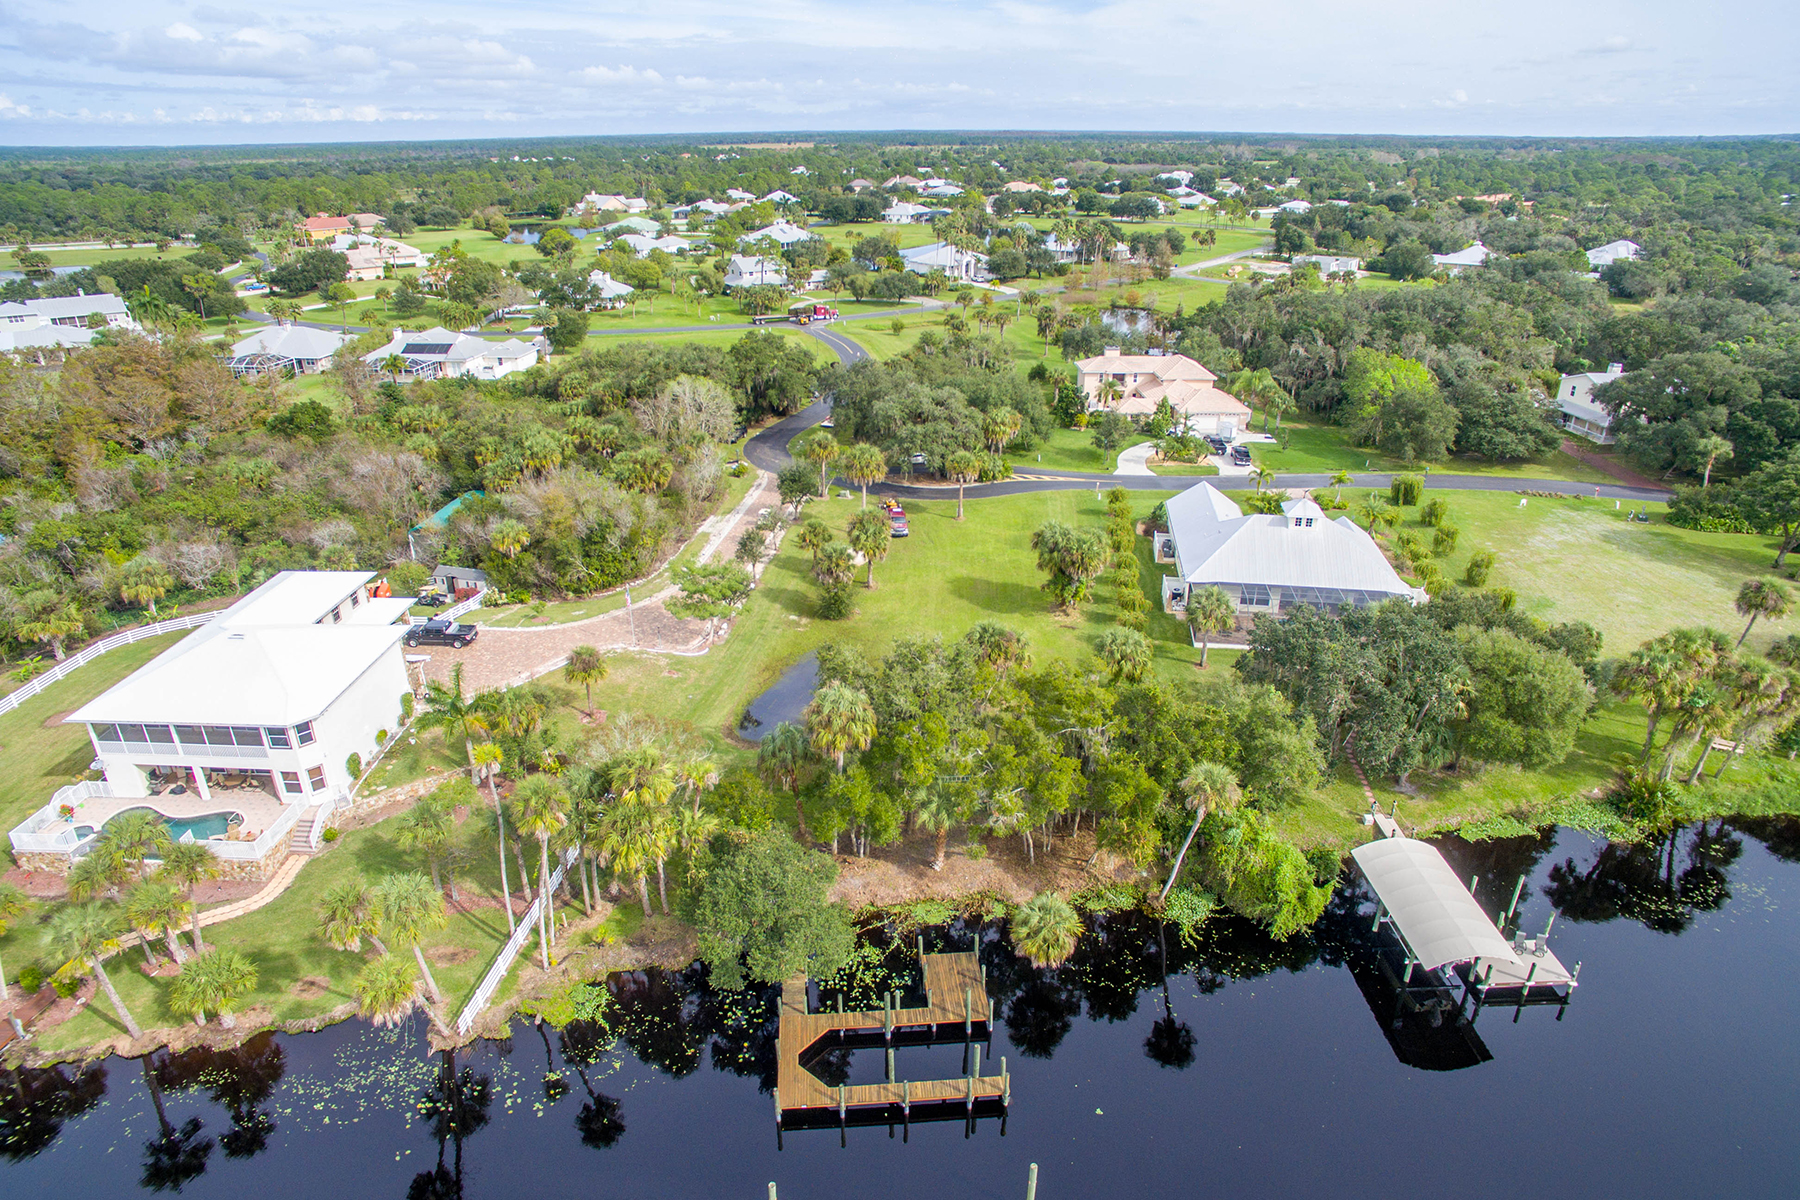 Land for Sale at ALVA 16420 Oakview Cir, Alva, Florida 33920 United States